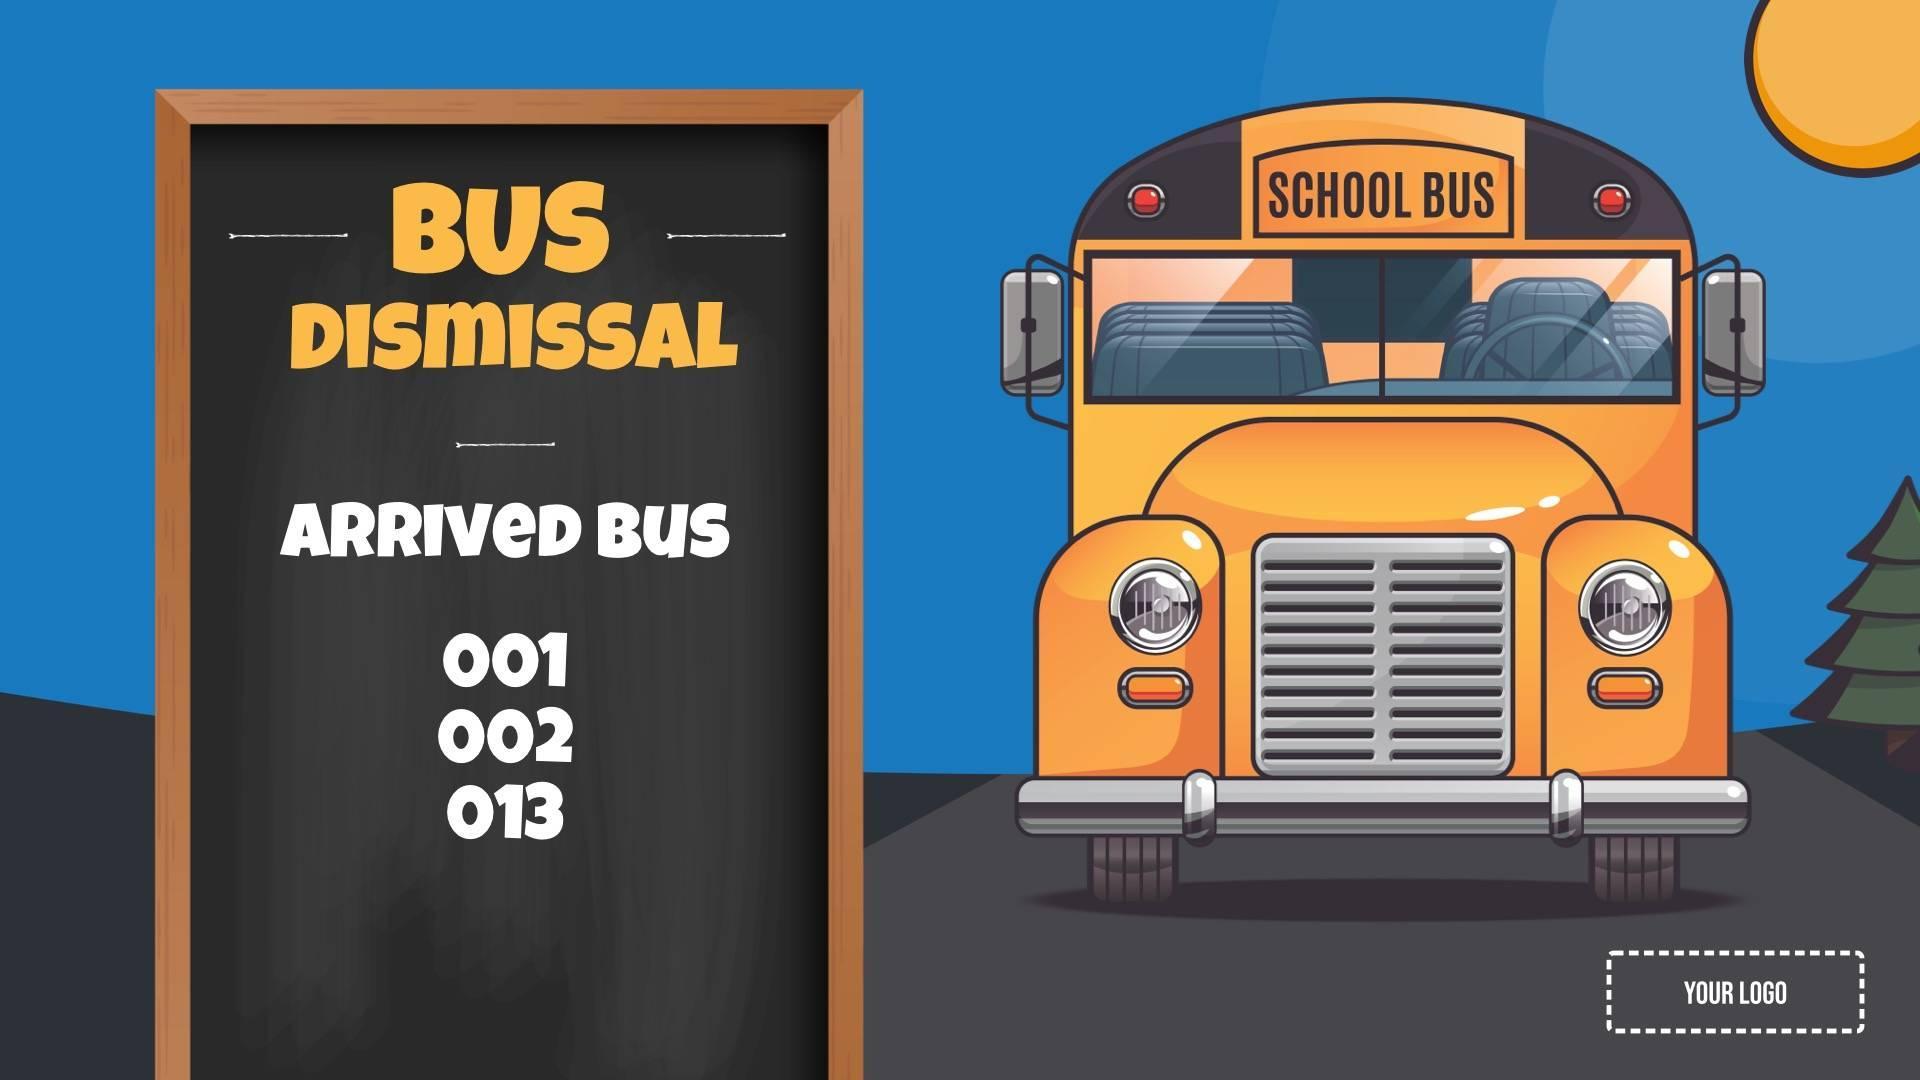 Bus Dismissal Digital Signage Template